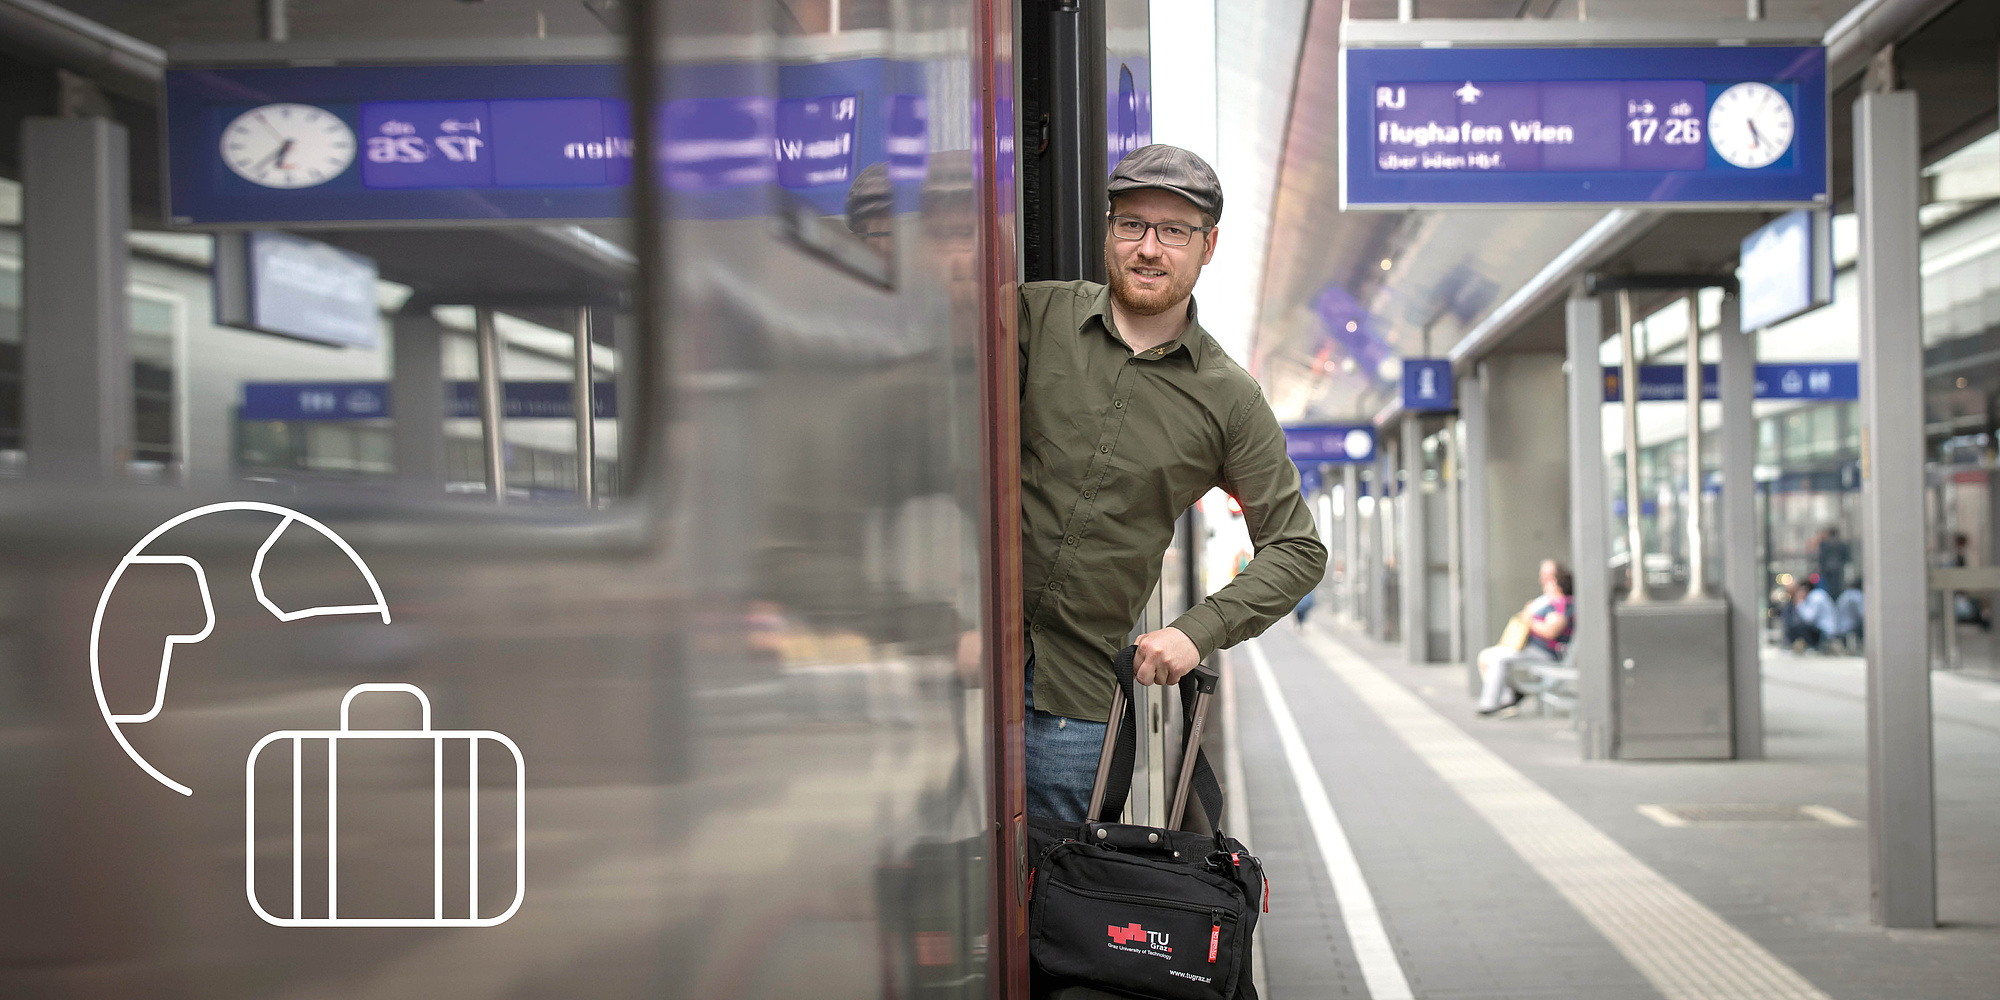 Man boards a train